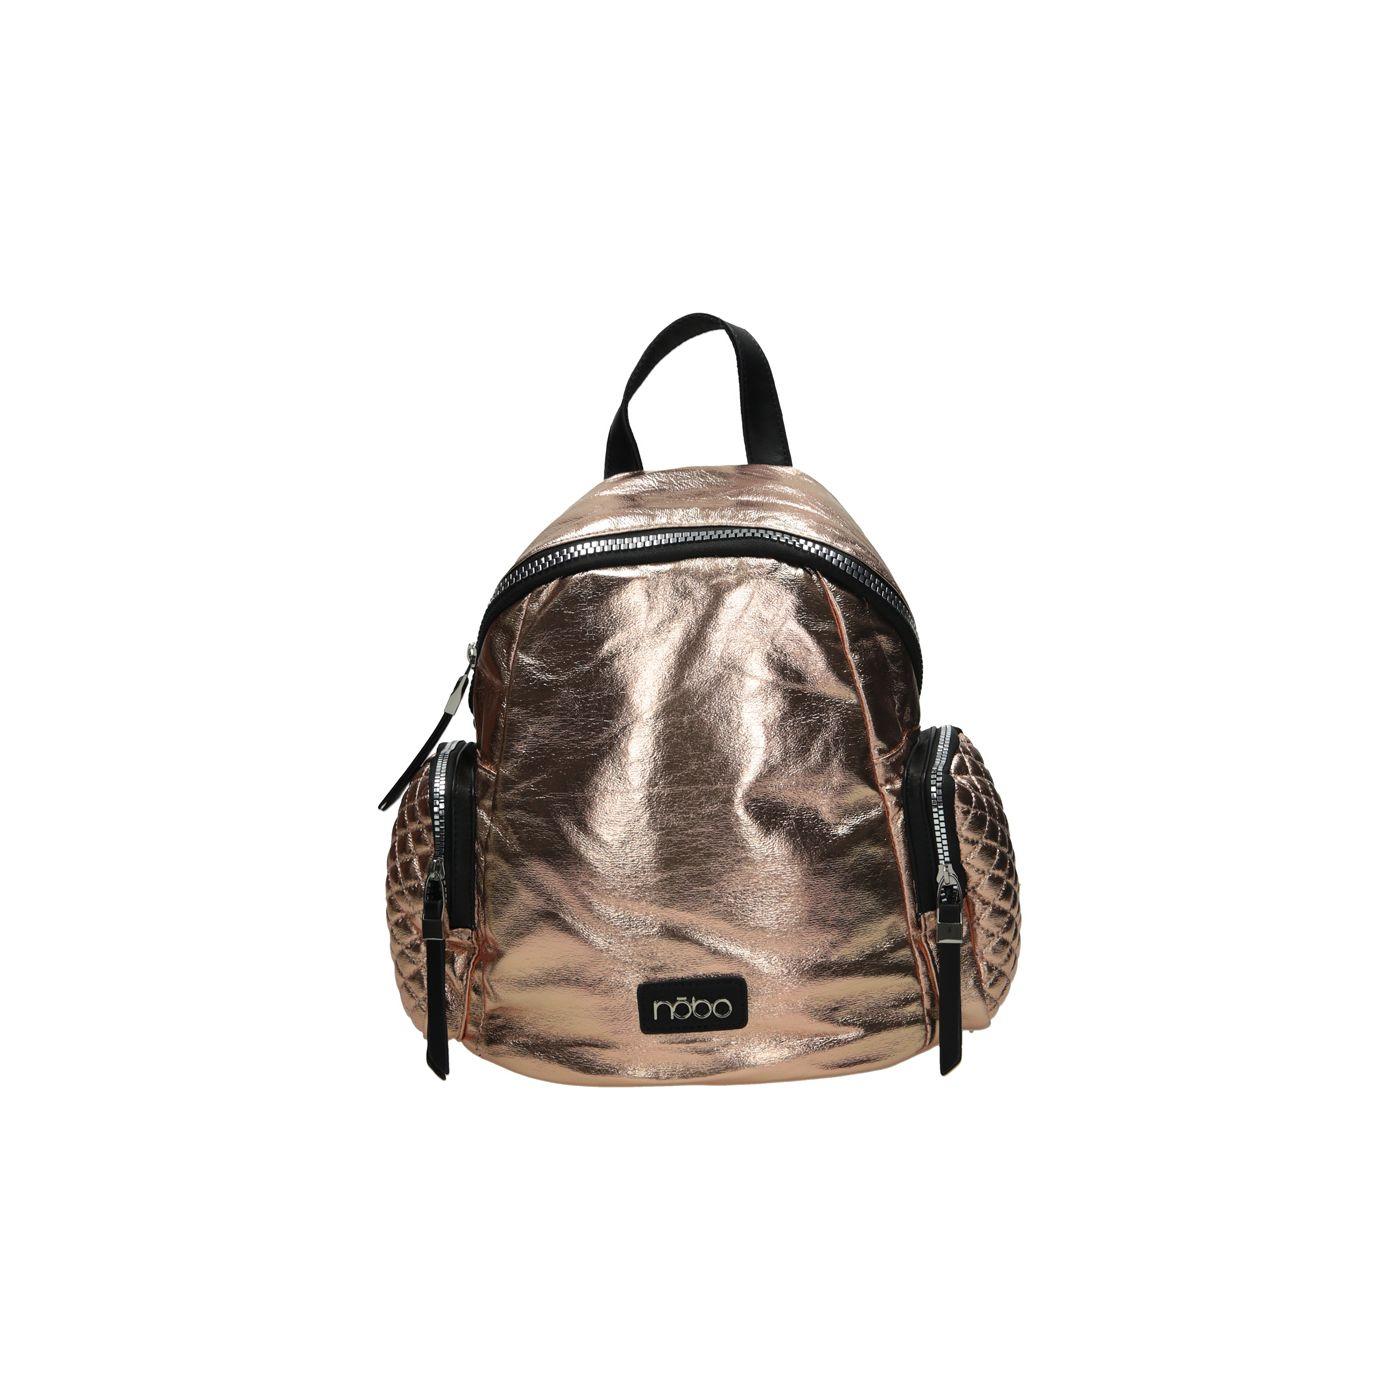 Nobo Woman's Backpack Nbag-G2520-C023